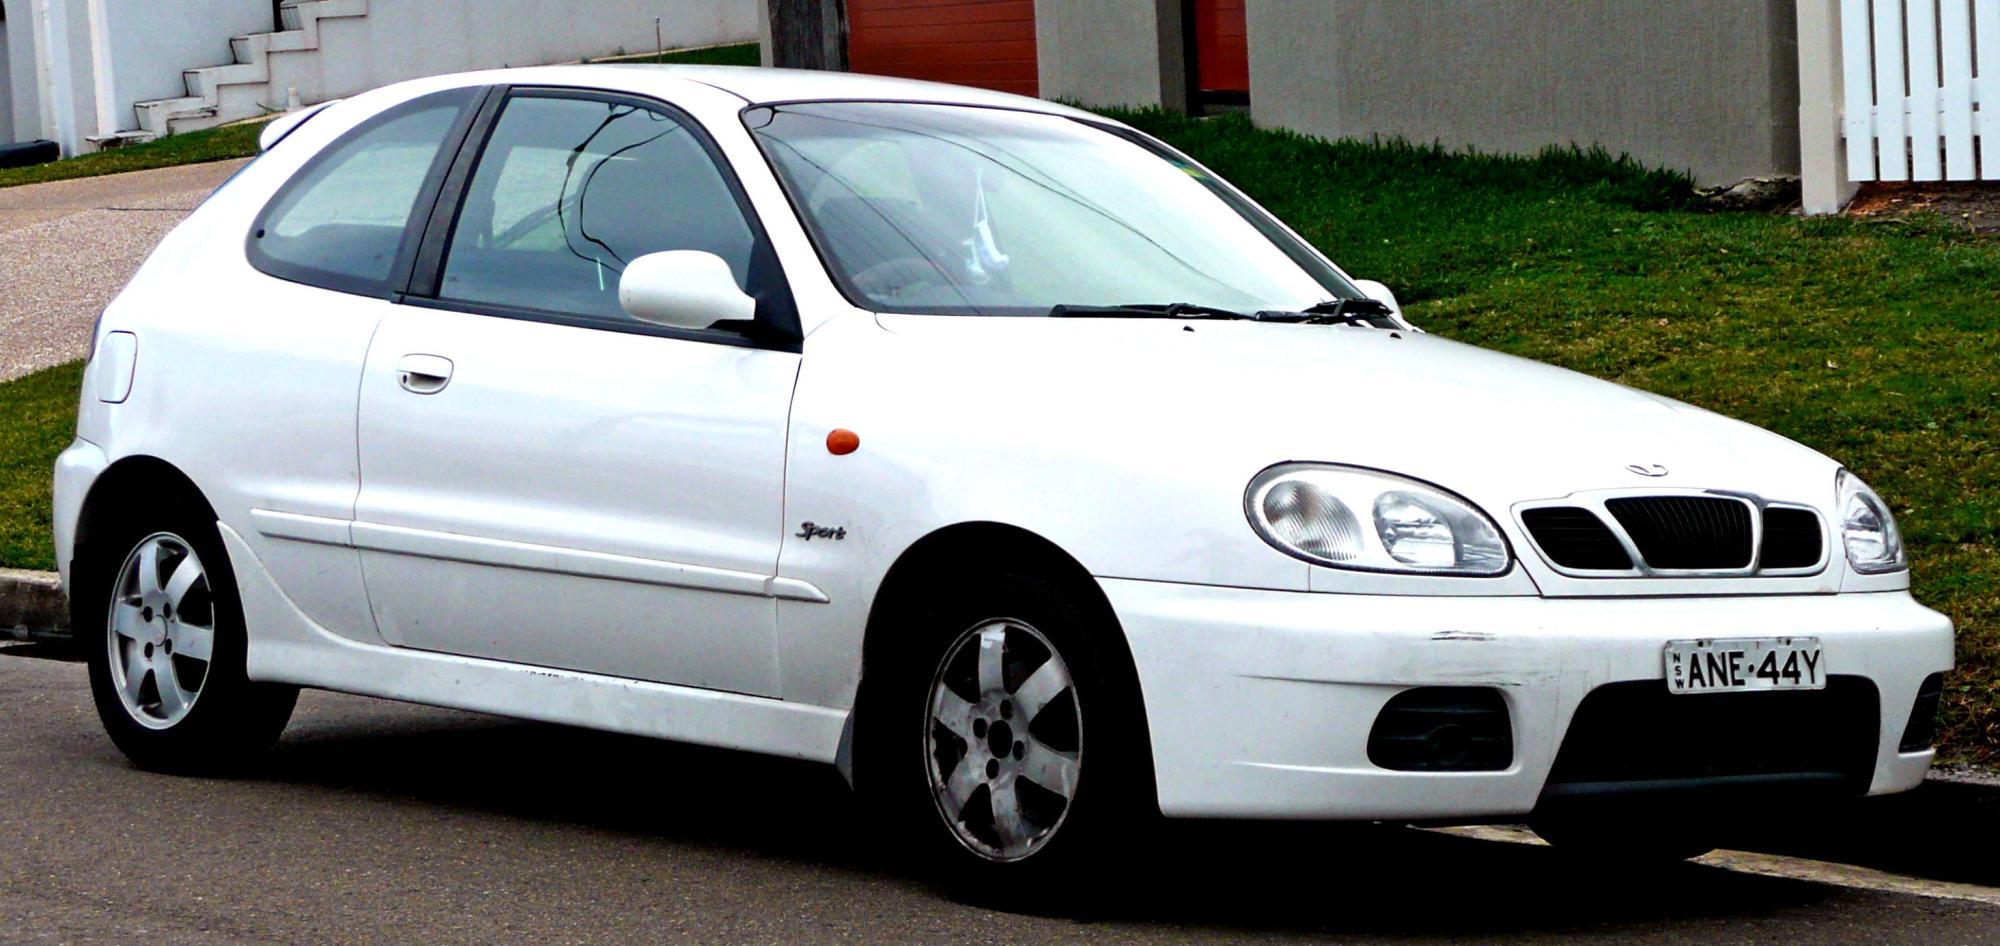 hight resolution of  daewoo nubira hatchback 2000 6